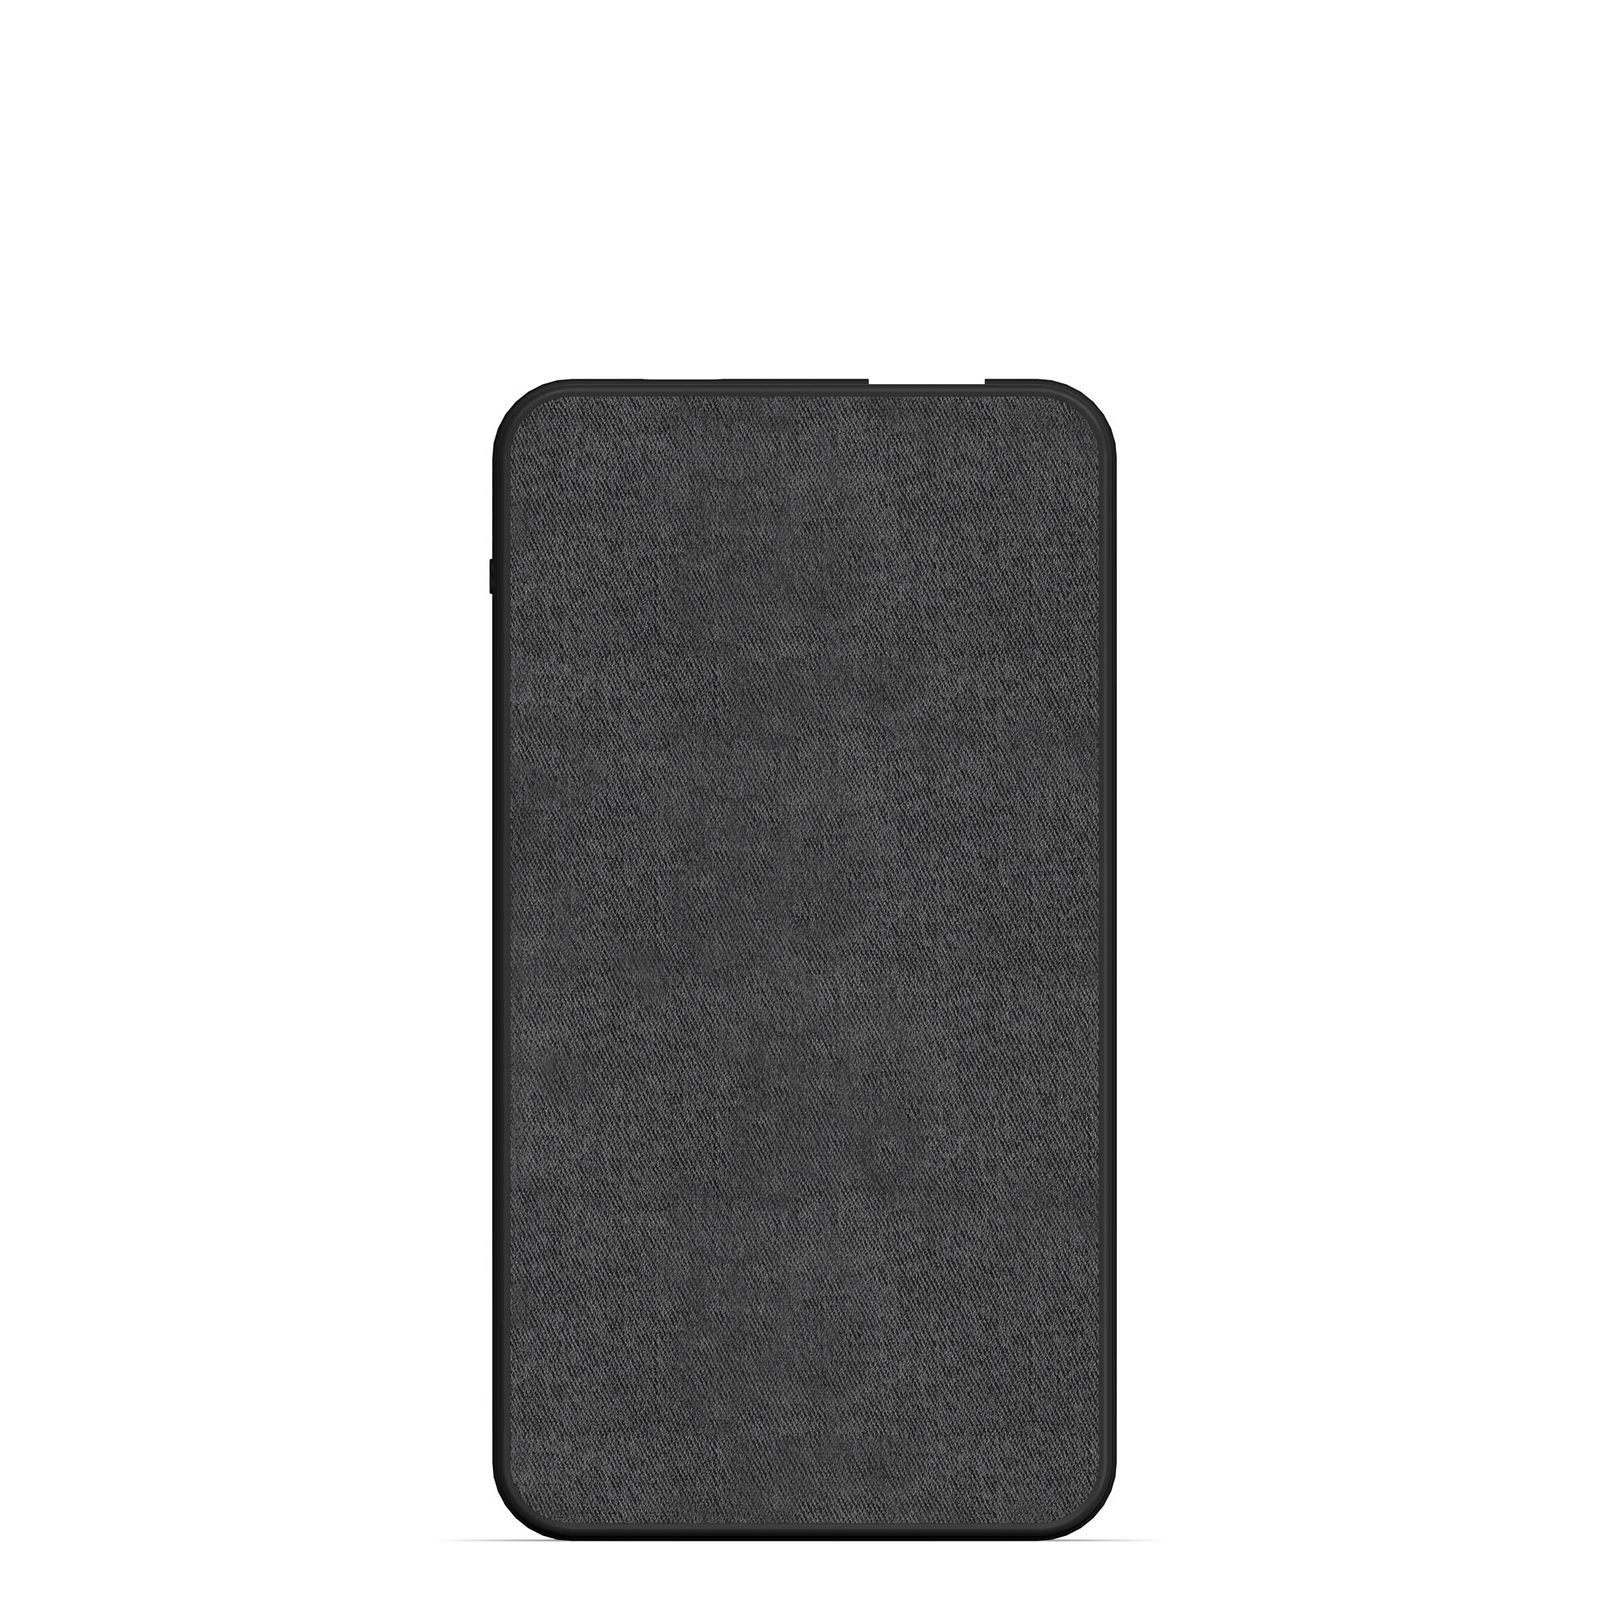 reputable site dba38 99d3f Mophie: Powerstation Mini (2019) 5,000 mAh Universal Battery - Black